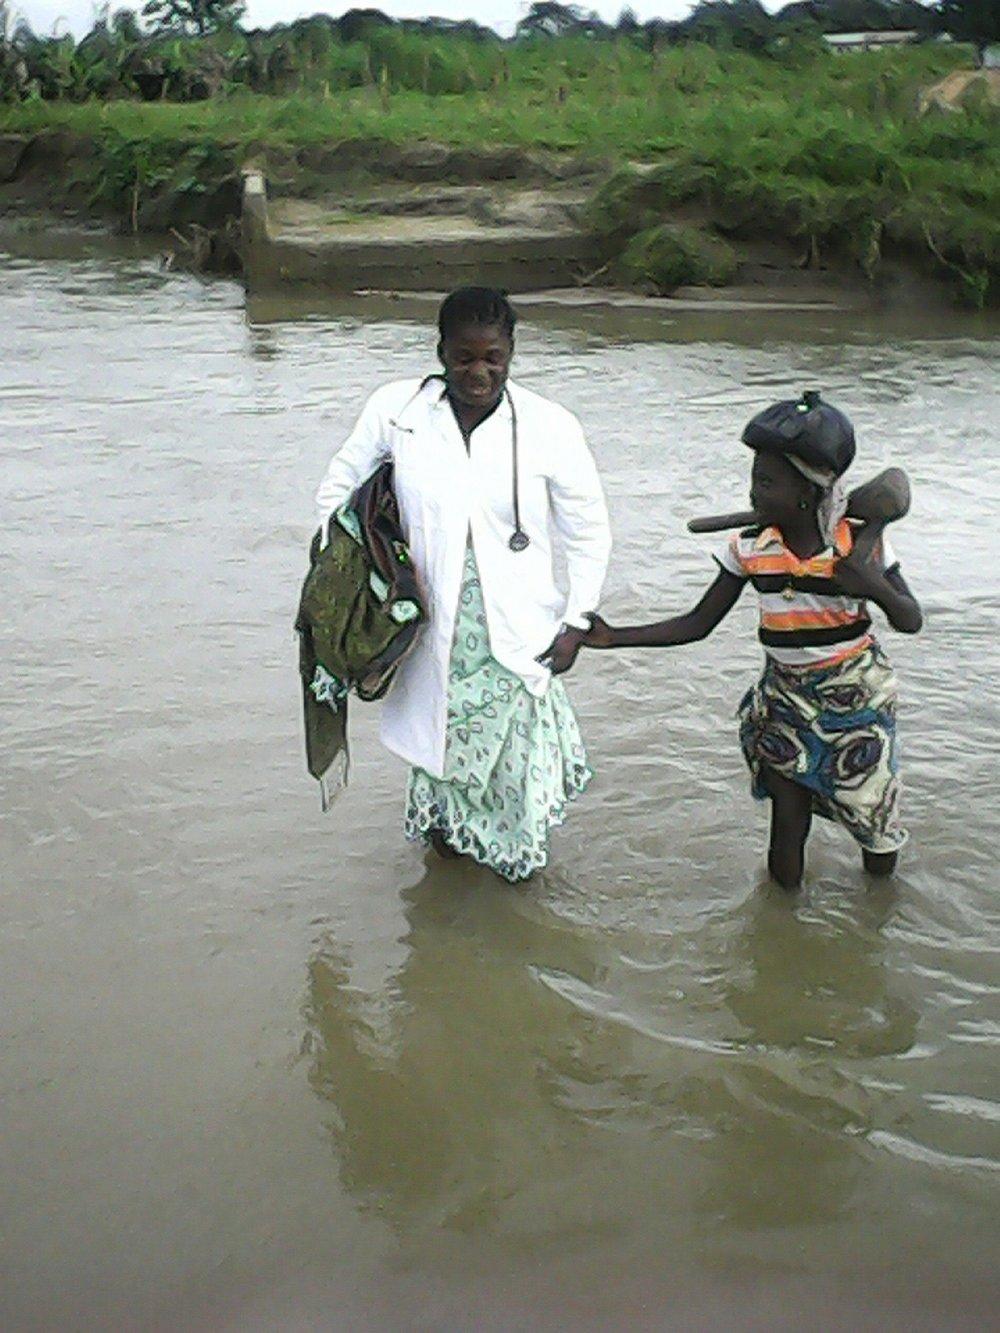 Fund for Global Health Nurse Deborah Silas bringing health care to a village in Nigeria during the rainy season.